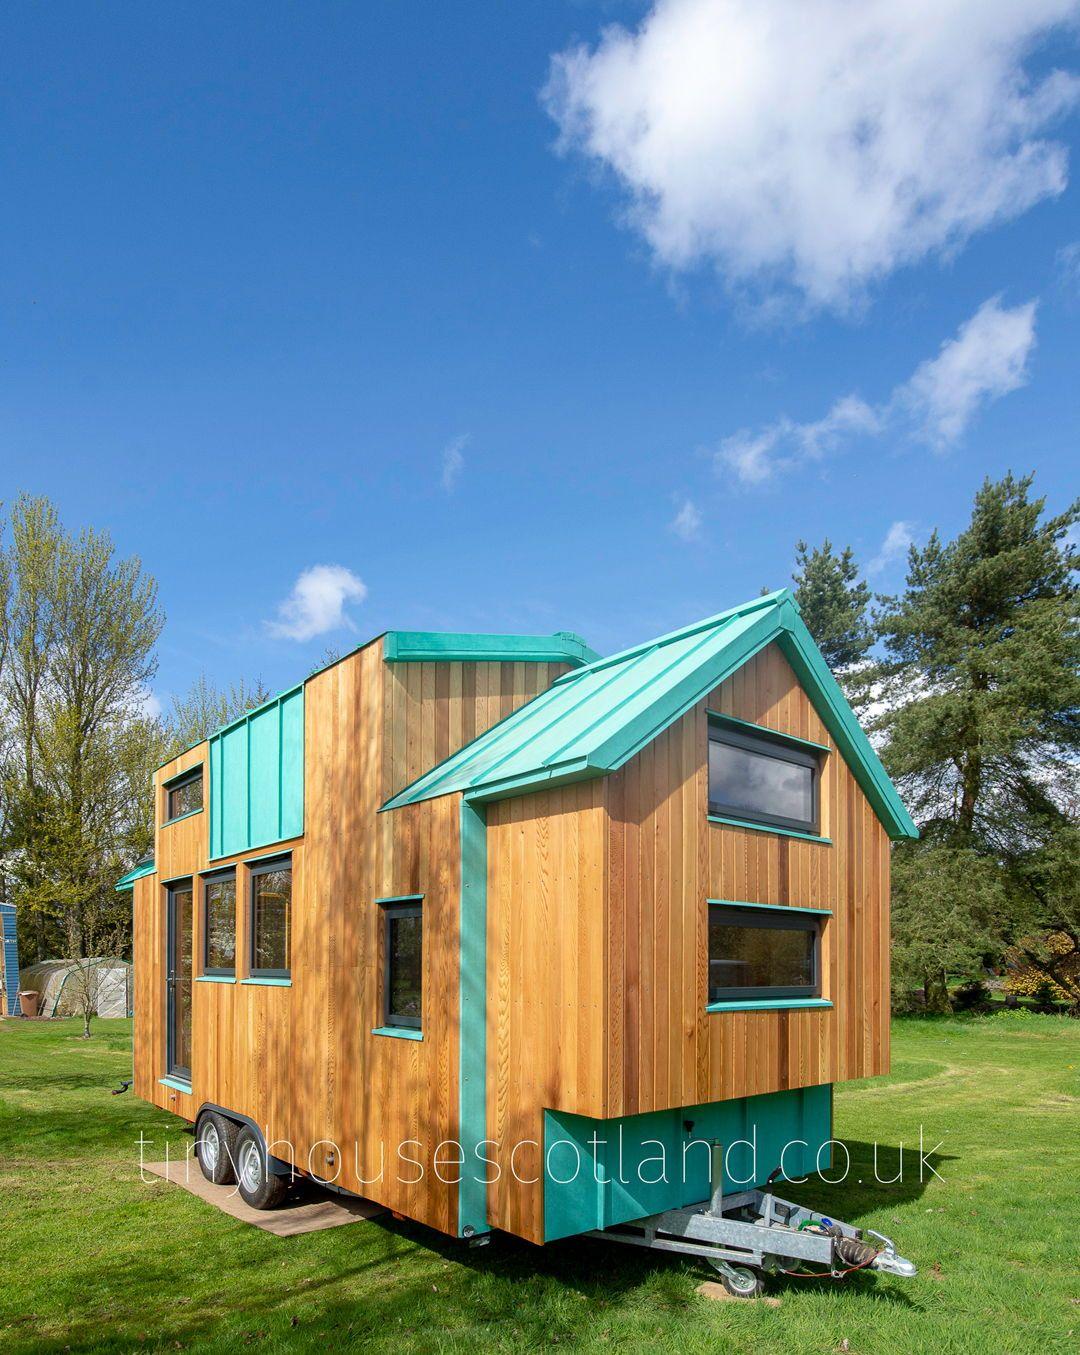 NestPod by Tiny House Scotland  Tiny house, Tiny house trailer